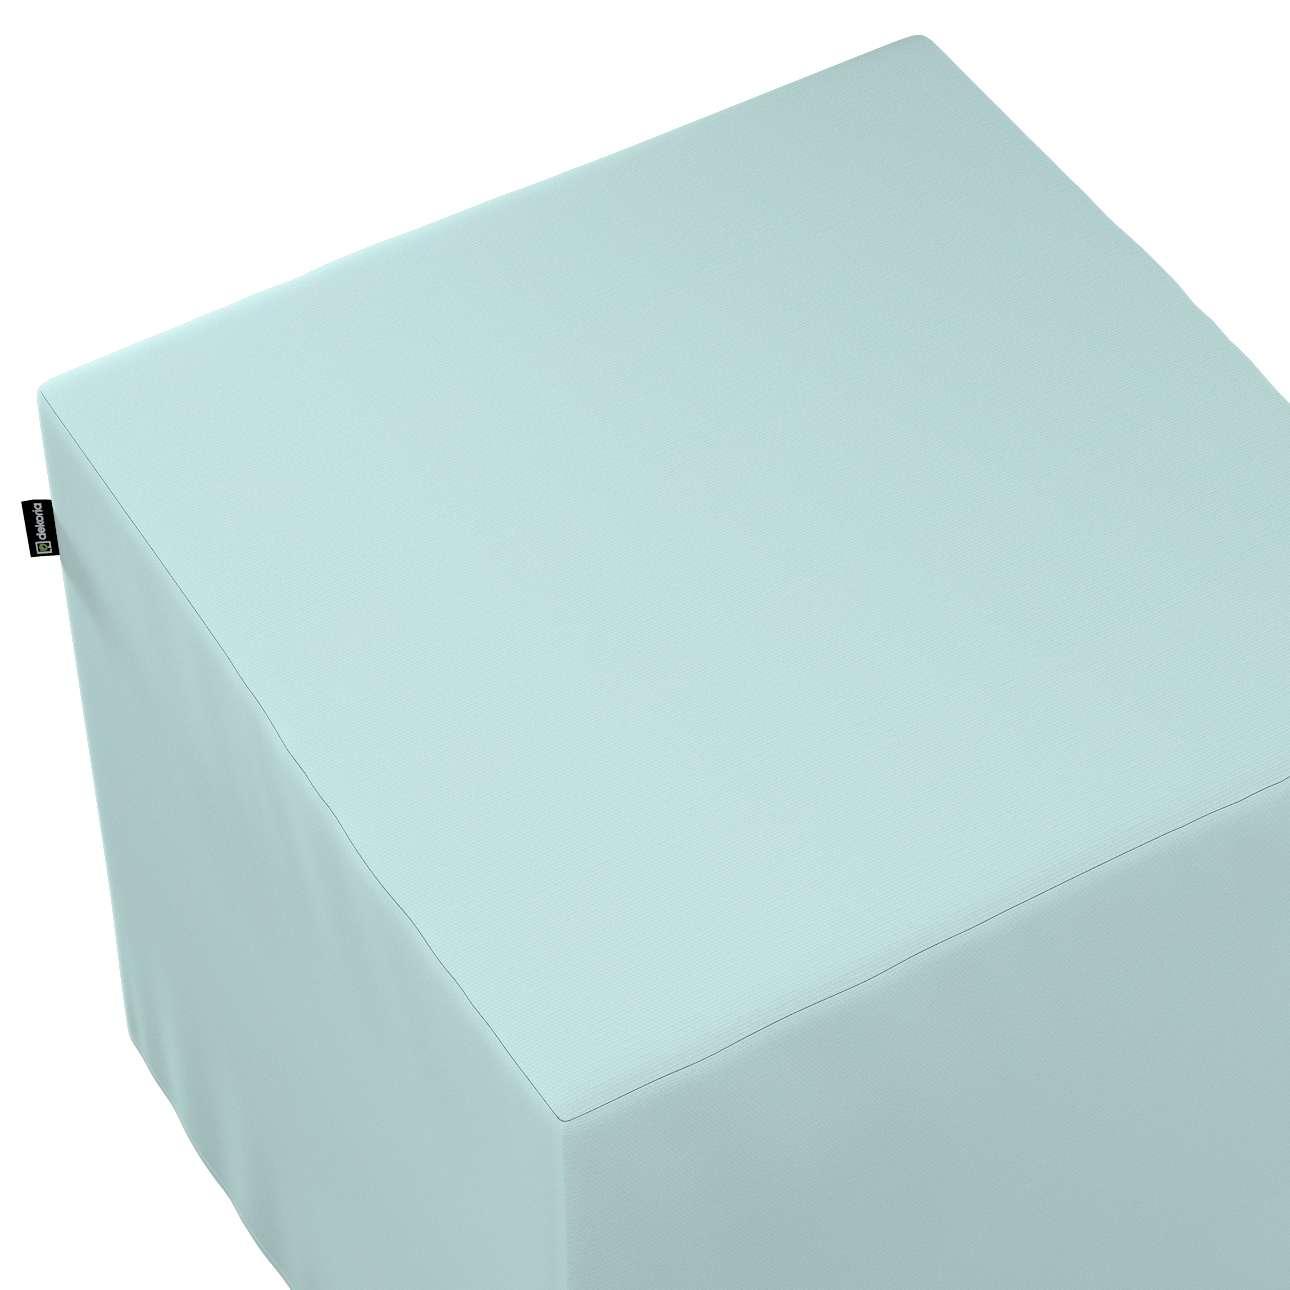 Taburetka tvrdá, kocka V kolekcii Cotton Panama, tkanina: 702-10